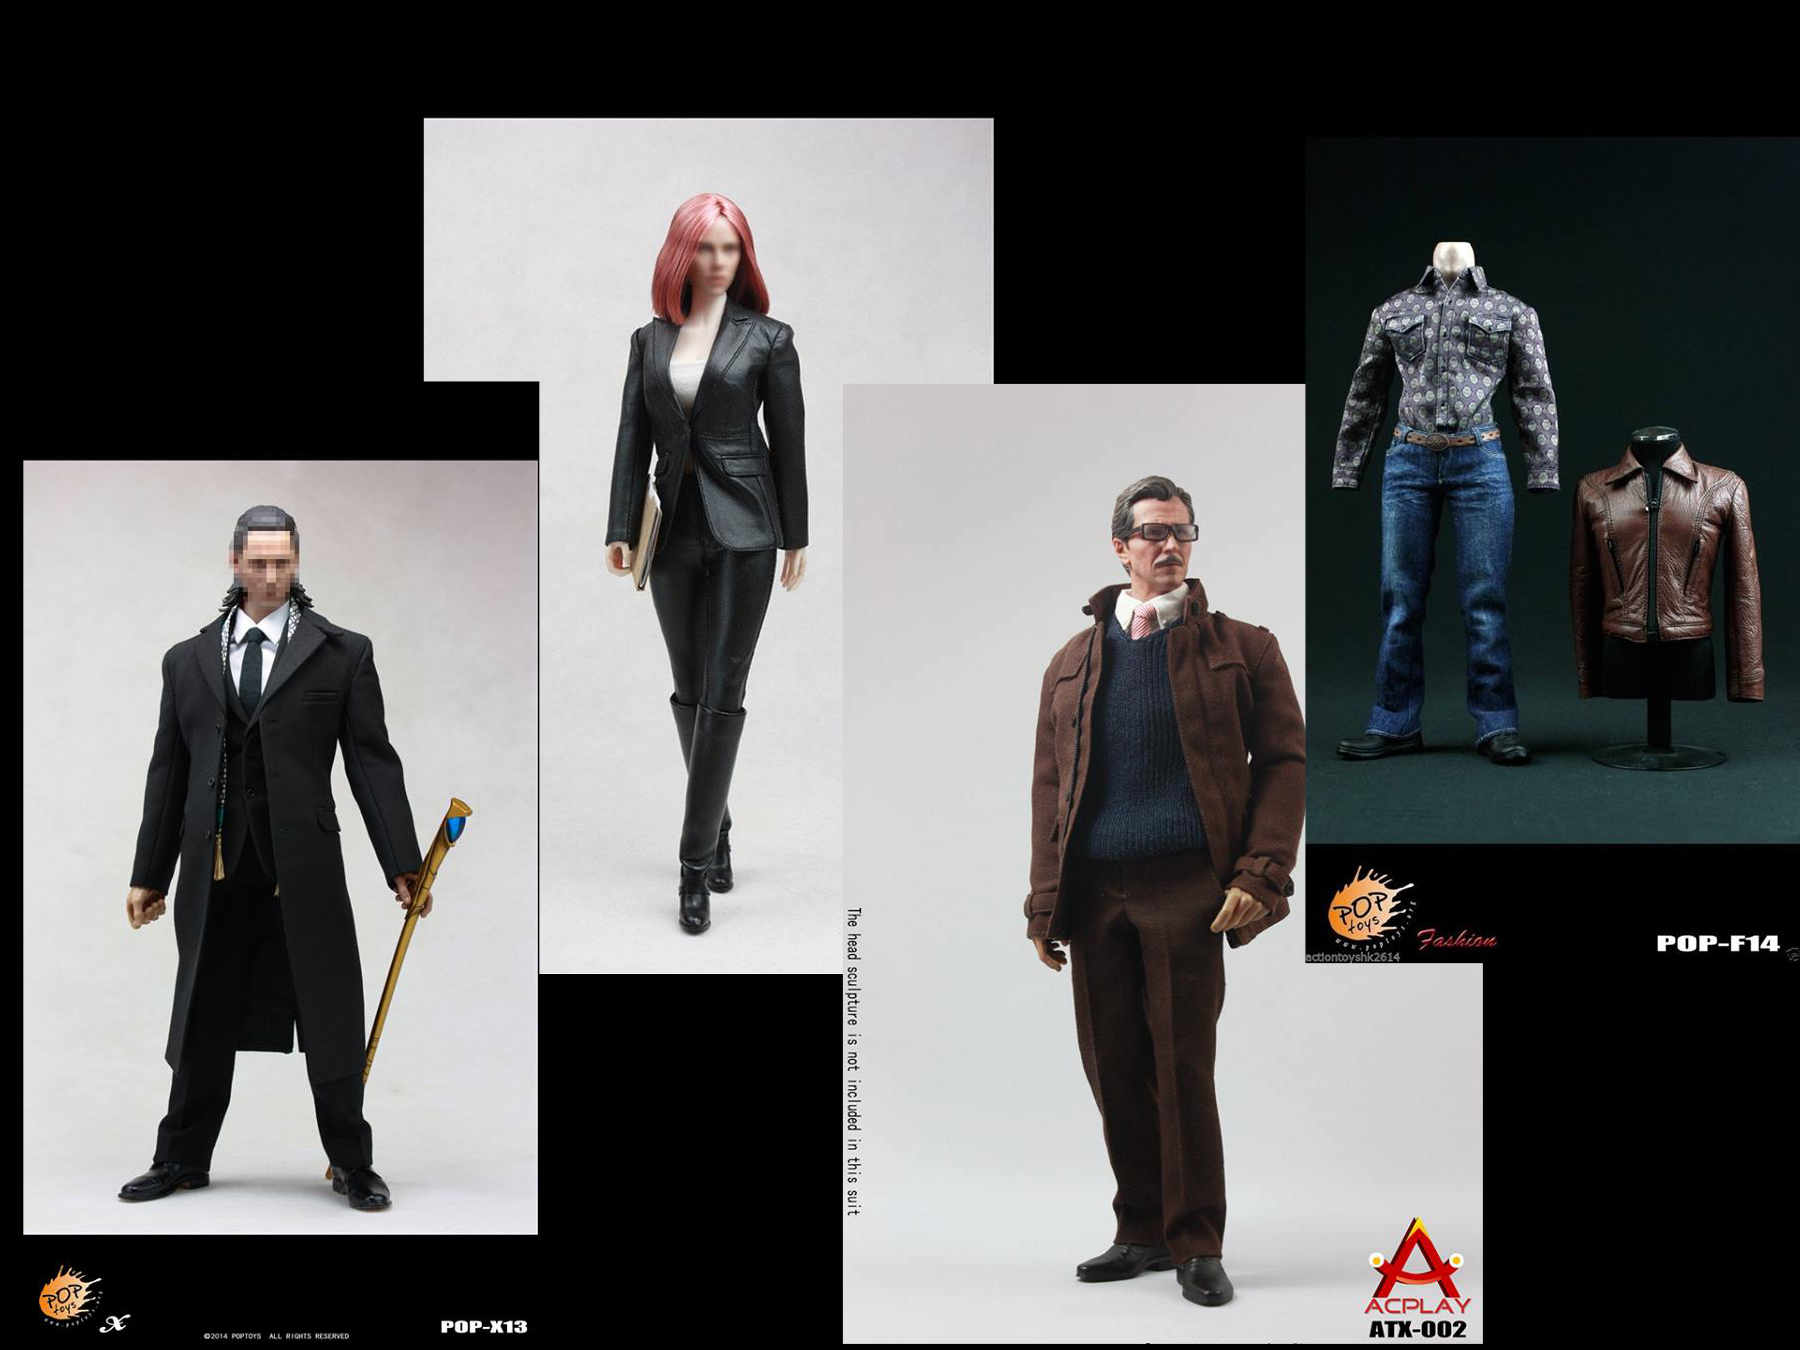 POPTOYS Wolverine Leather suit //Loki Windbreaker Suit // Spy Leather Suit // Gordon Coat suit